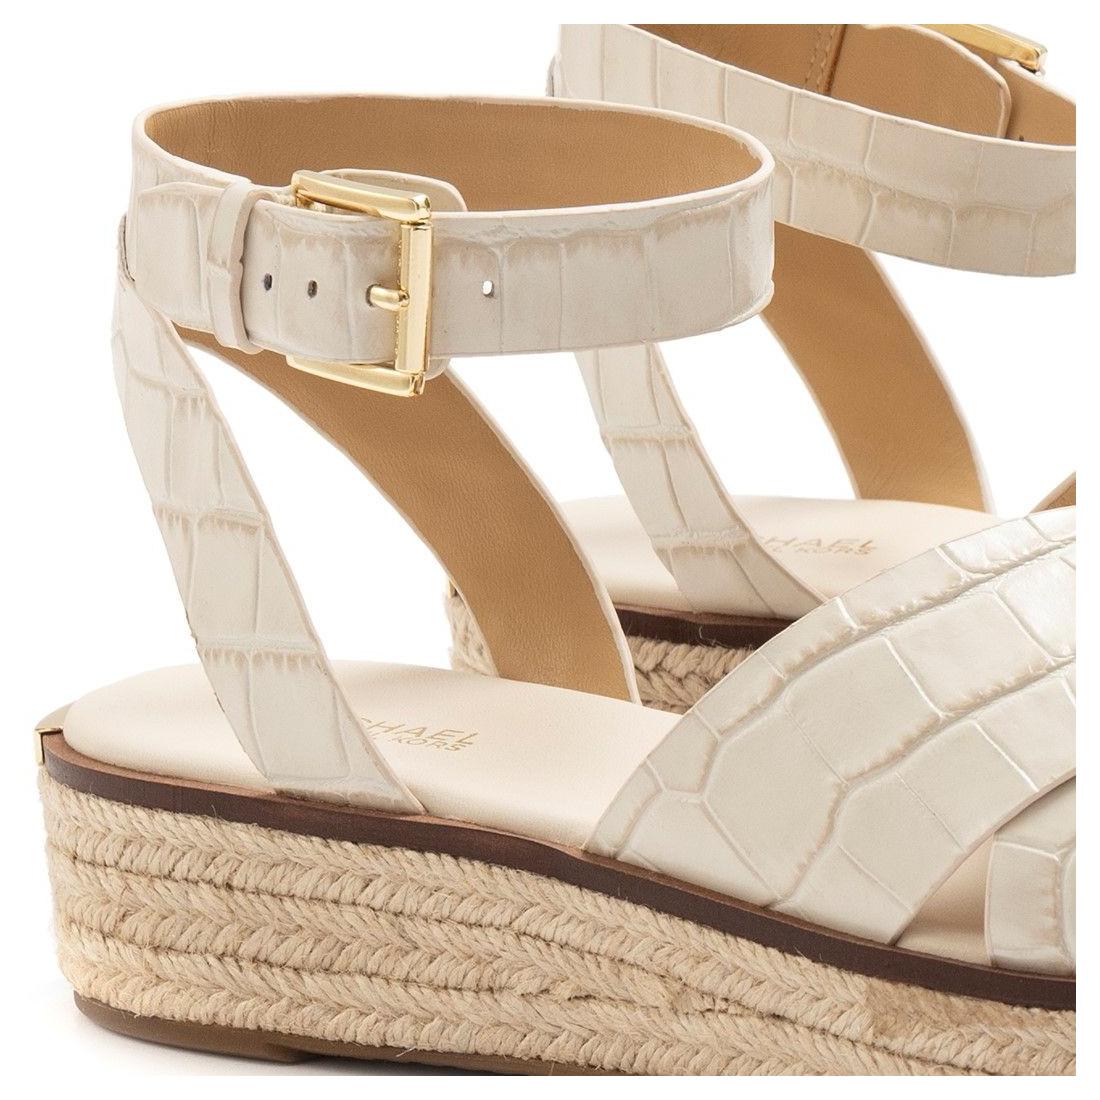 sandals woman michael kors 40s0abfa1e289 6809